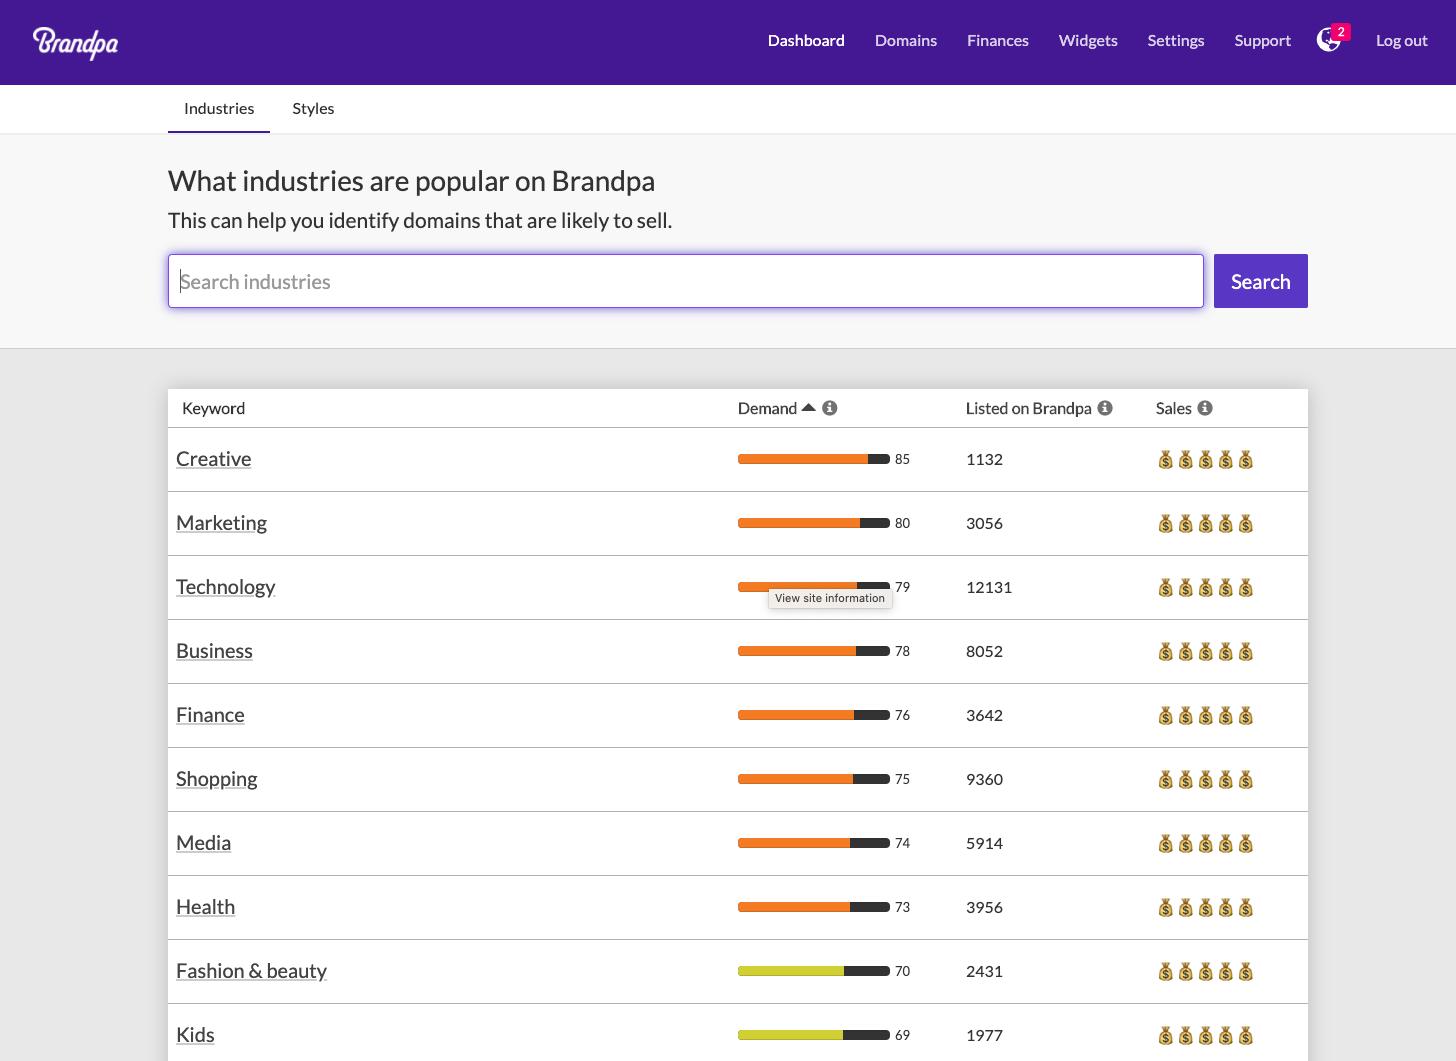 Popular industries on Brandpa